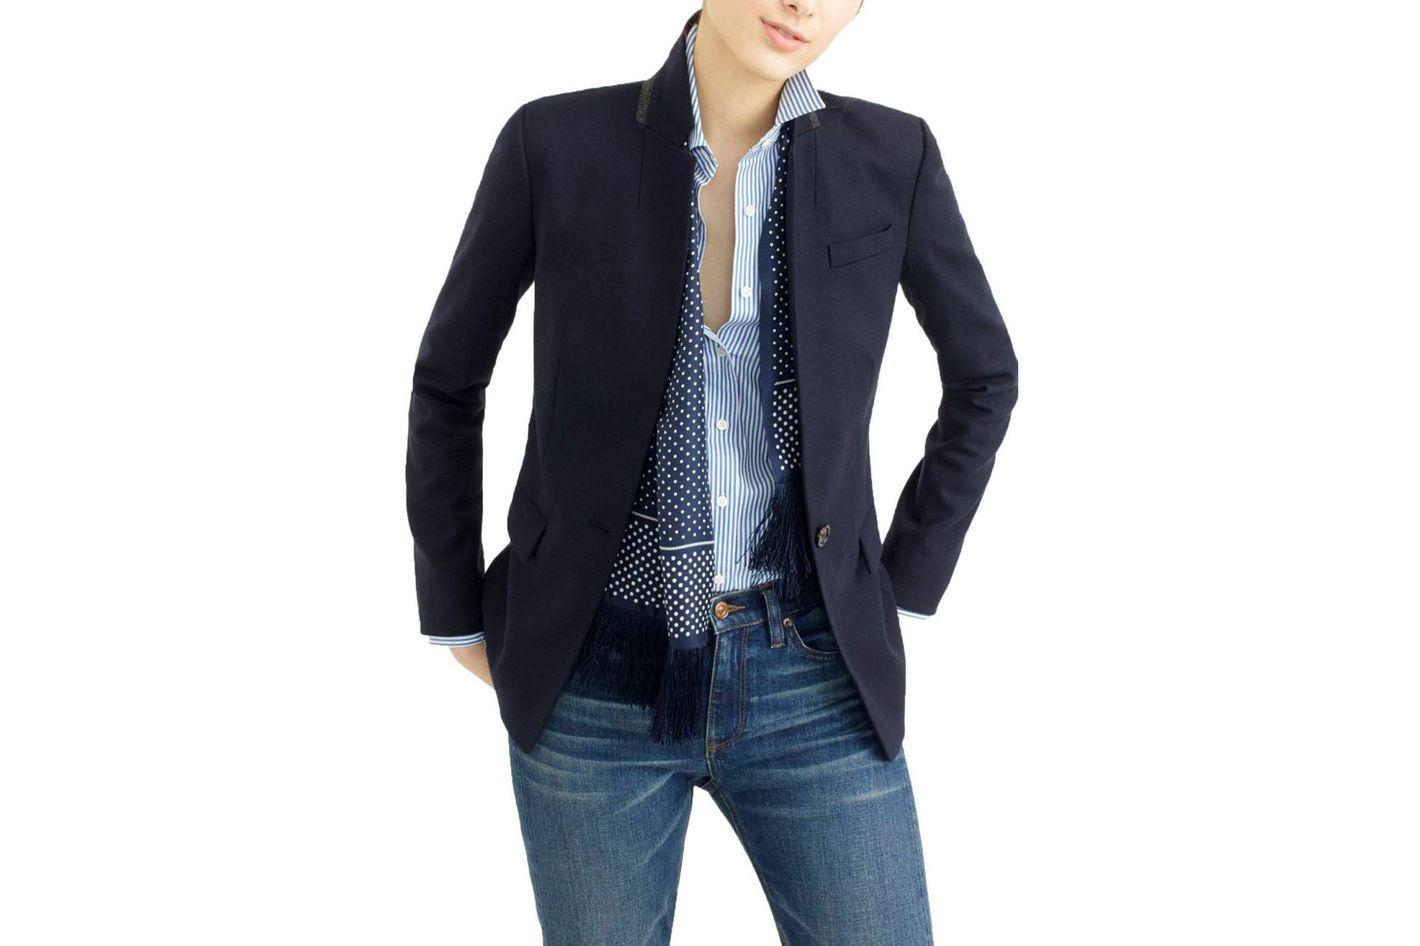 J. Crew Regent Stand Collar Blazer